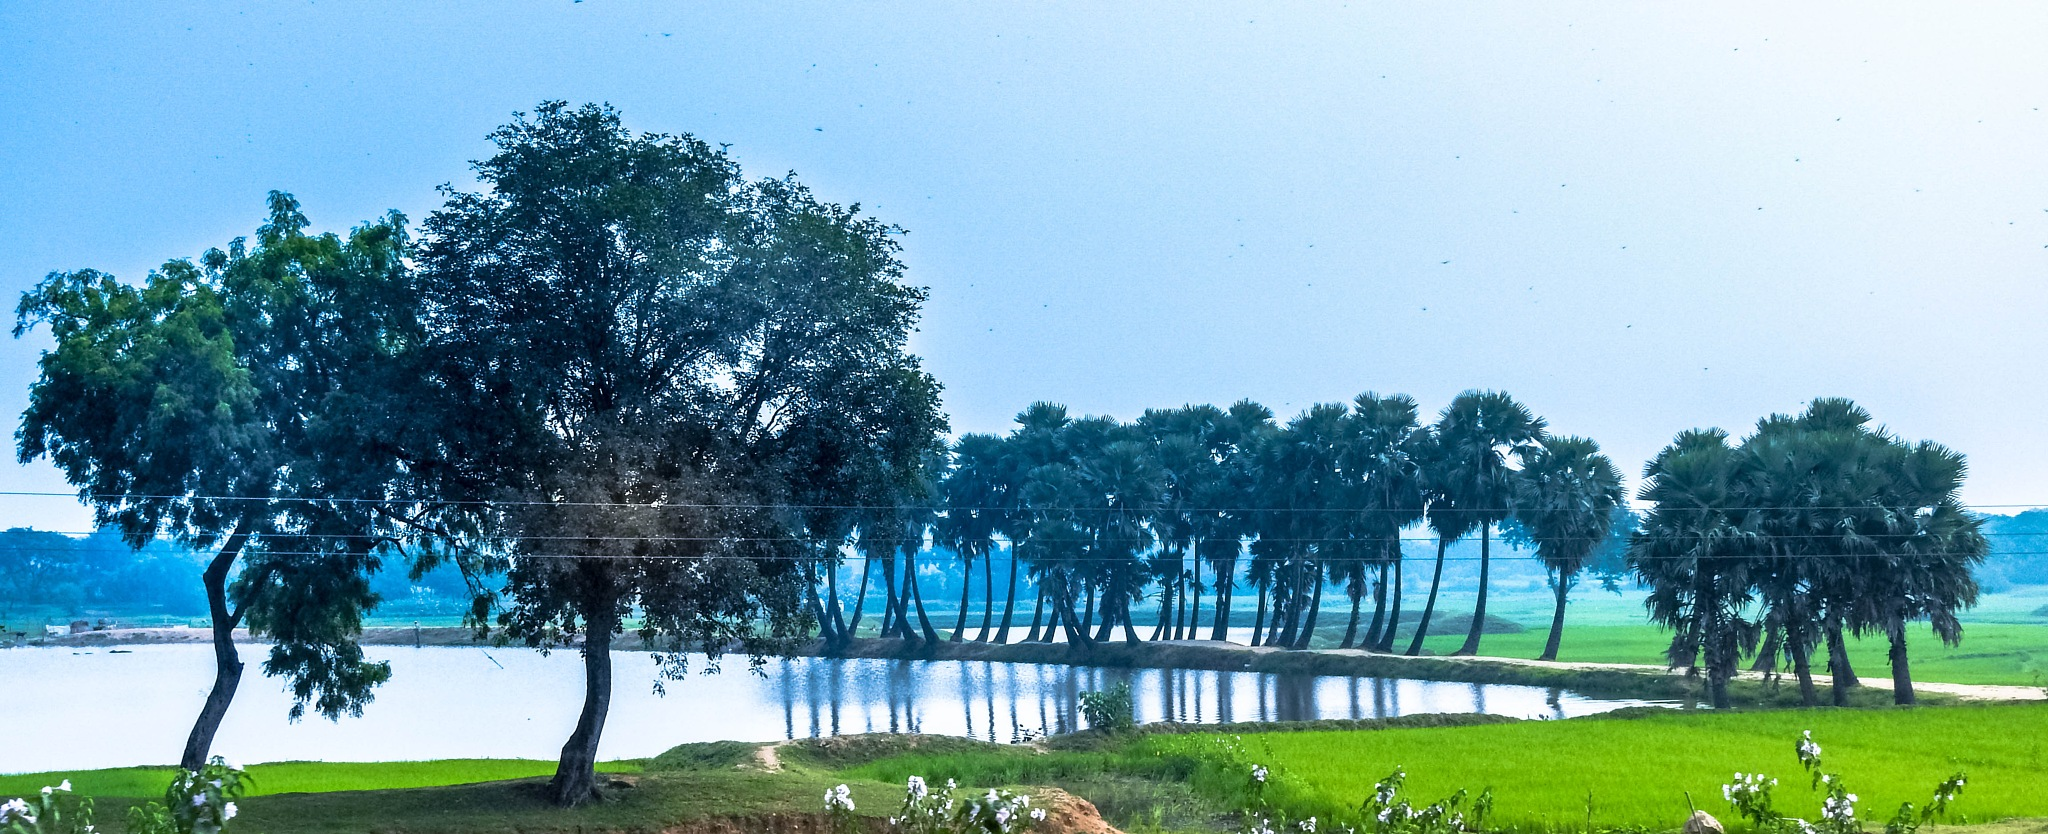 Pond by Kumar Munna